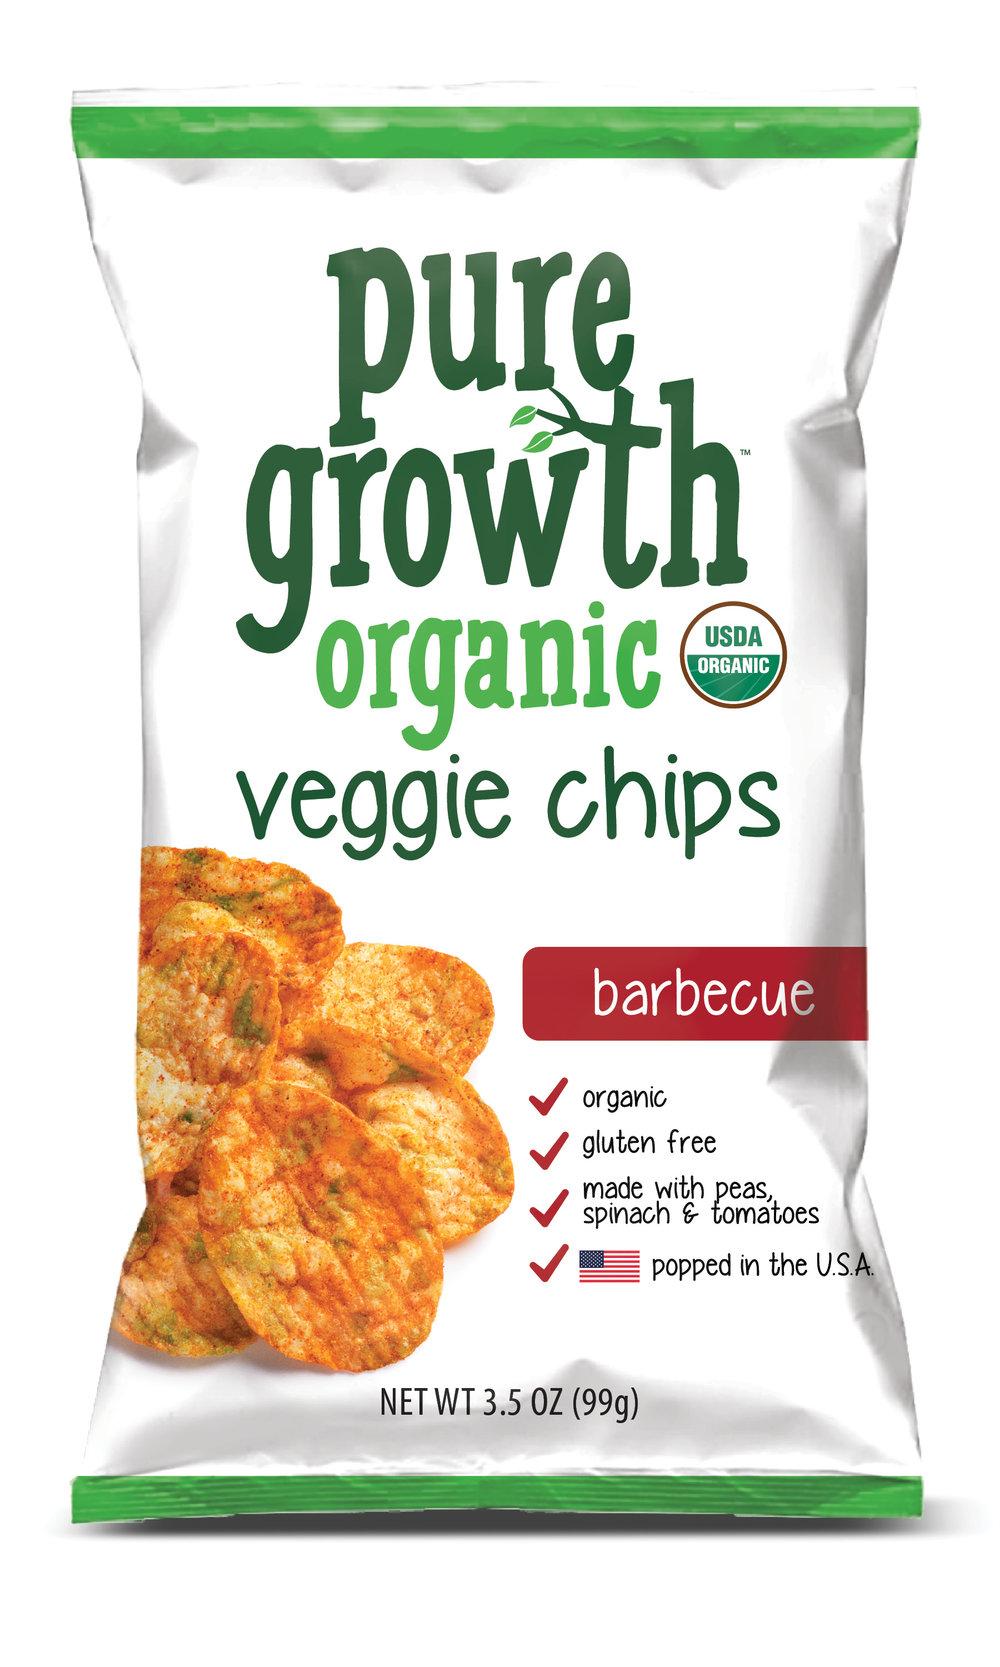 Veggie_Chips_barbecue.jpg